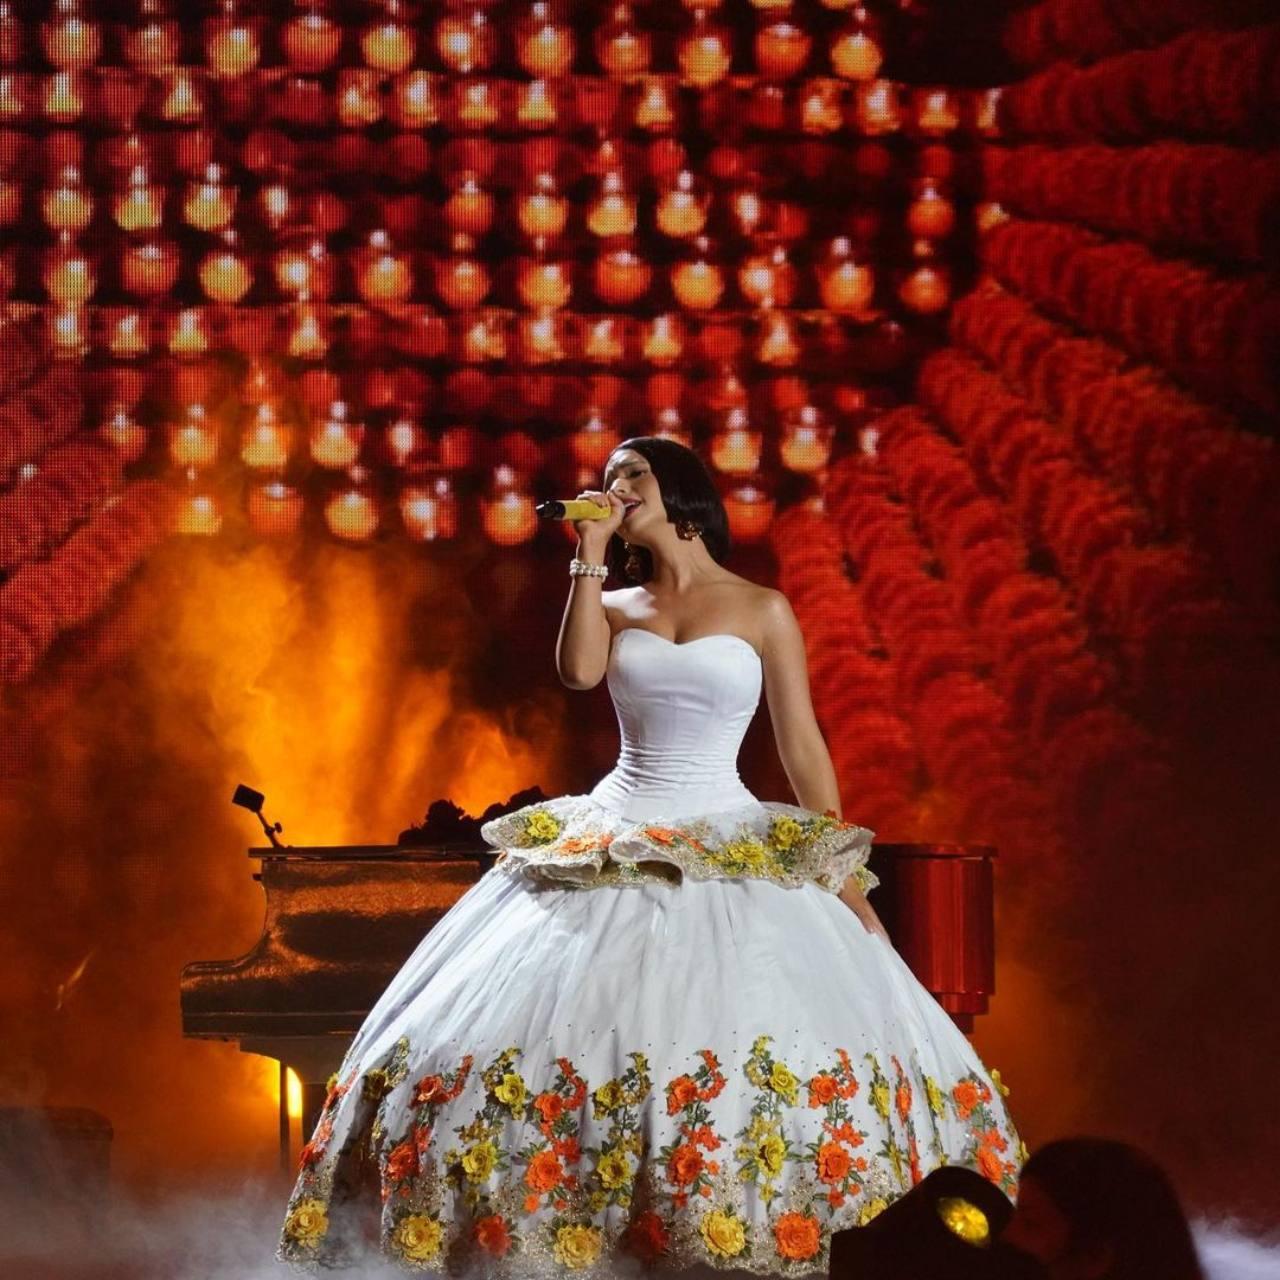 Angela Aguilar batea Nodal cantar nuevamente